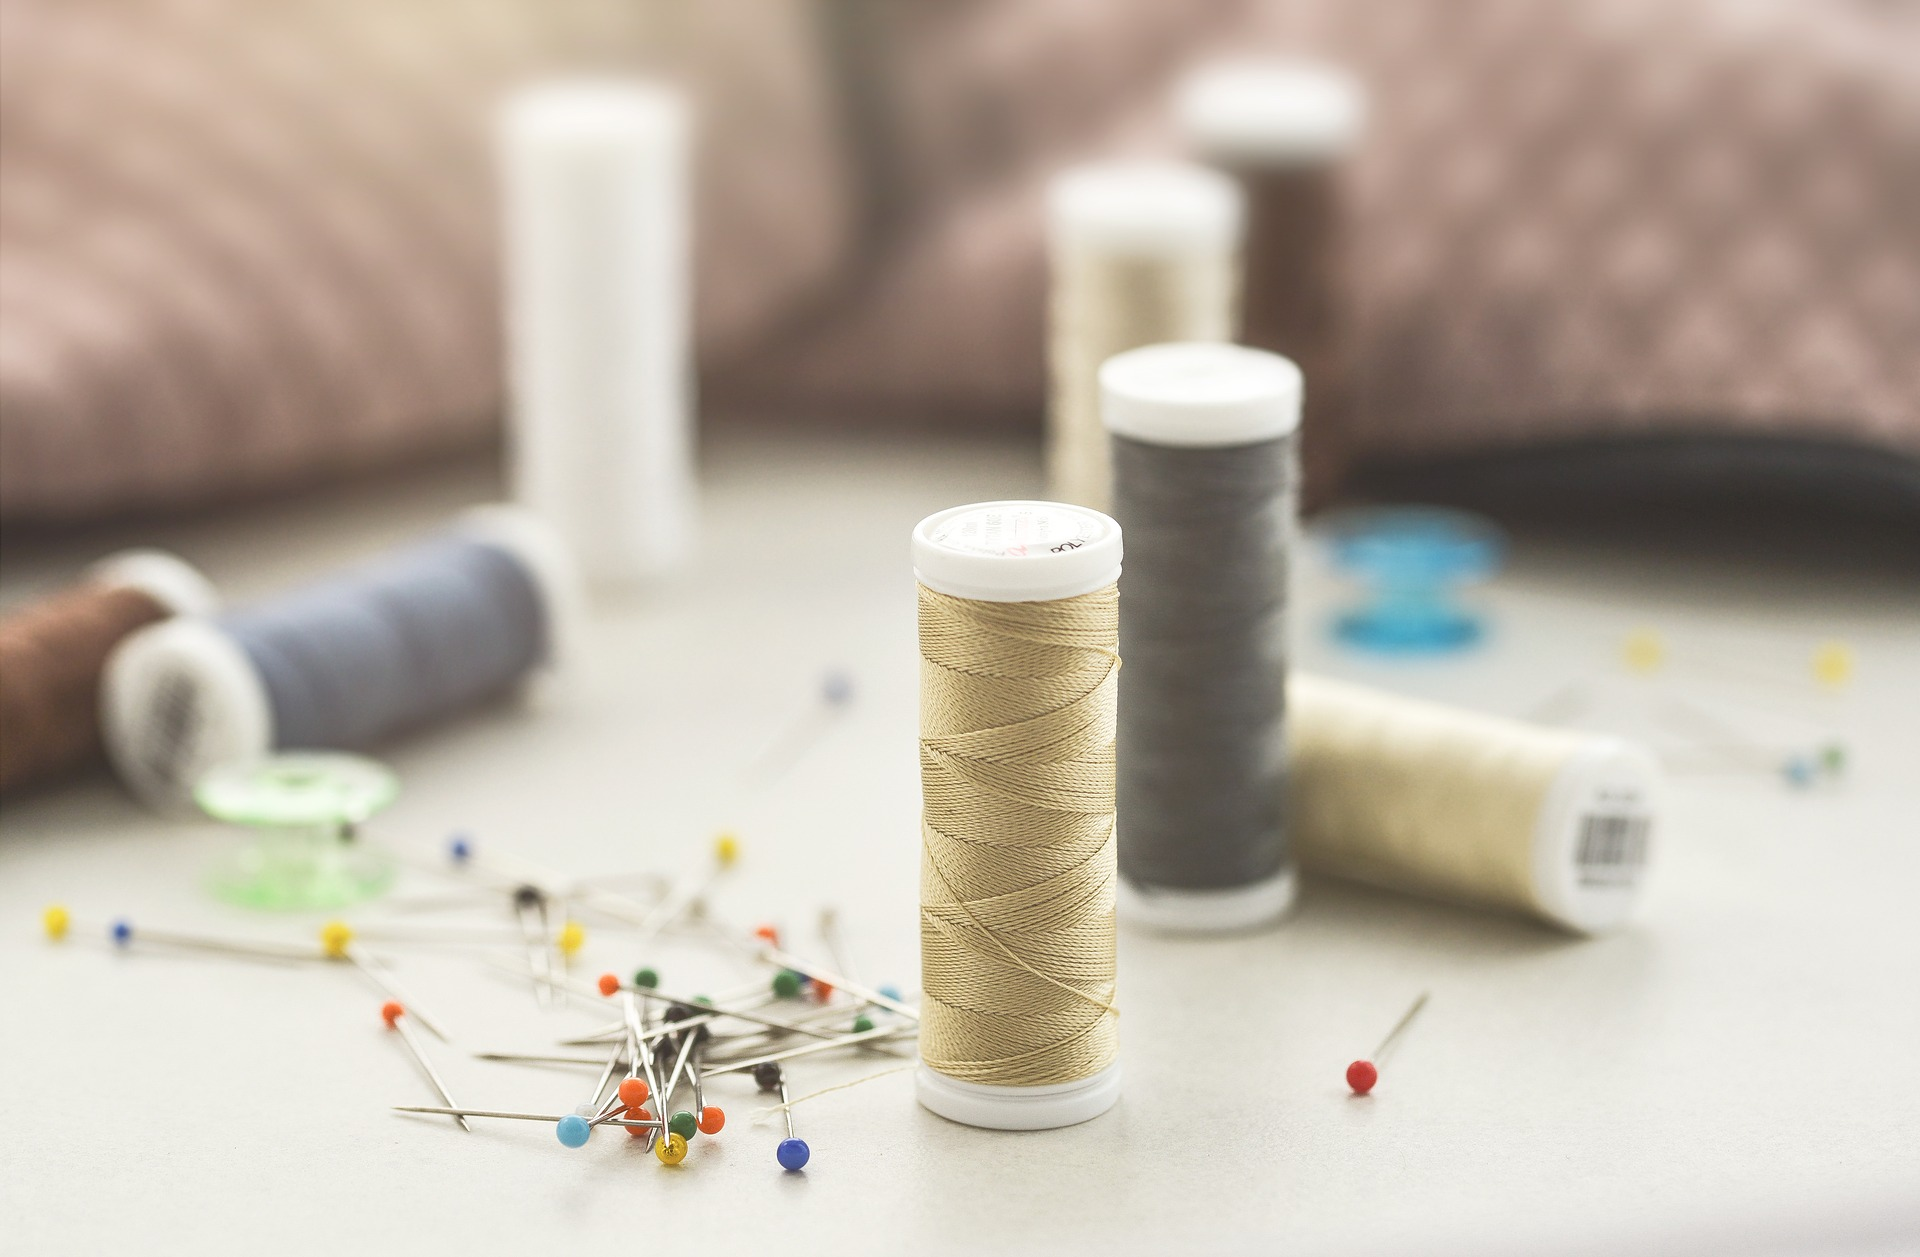 Qual è la differenza tra una tagliacuci e una macchina da cucire?